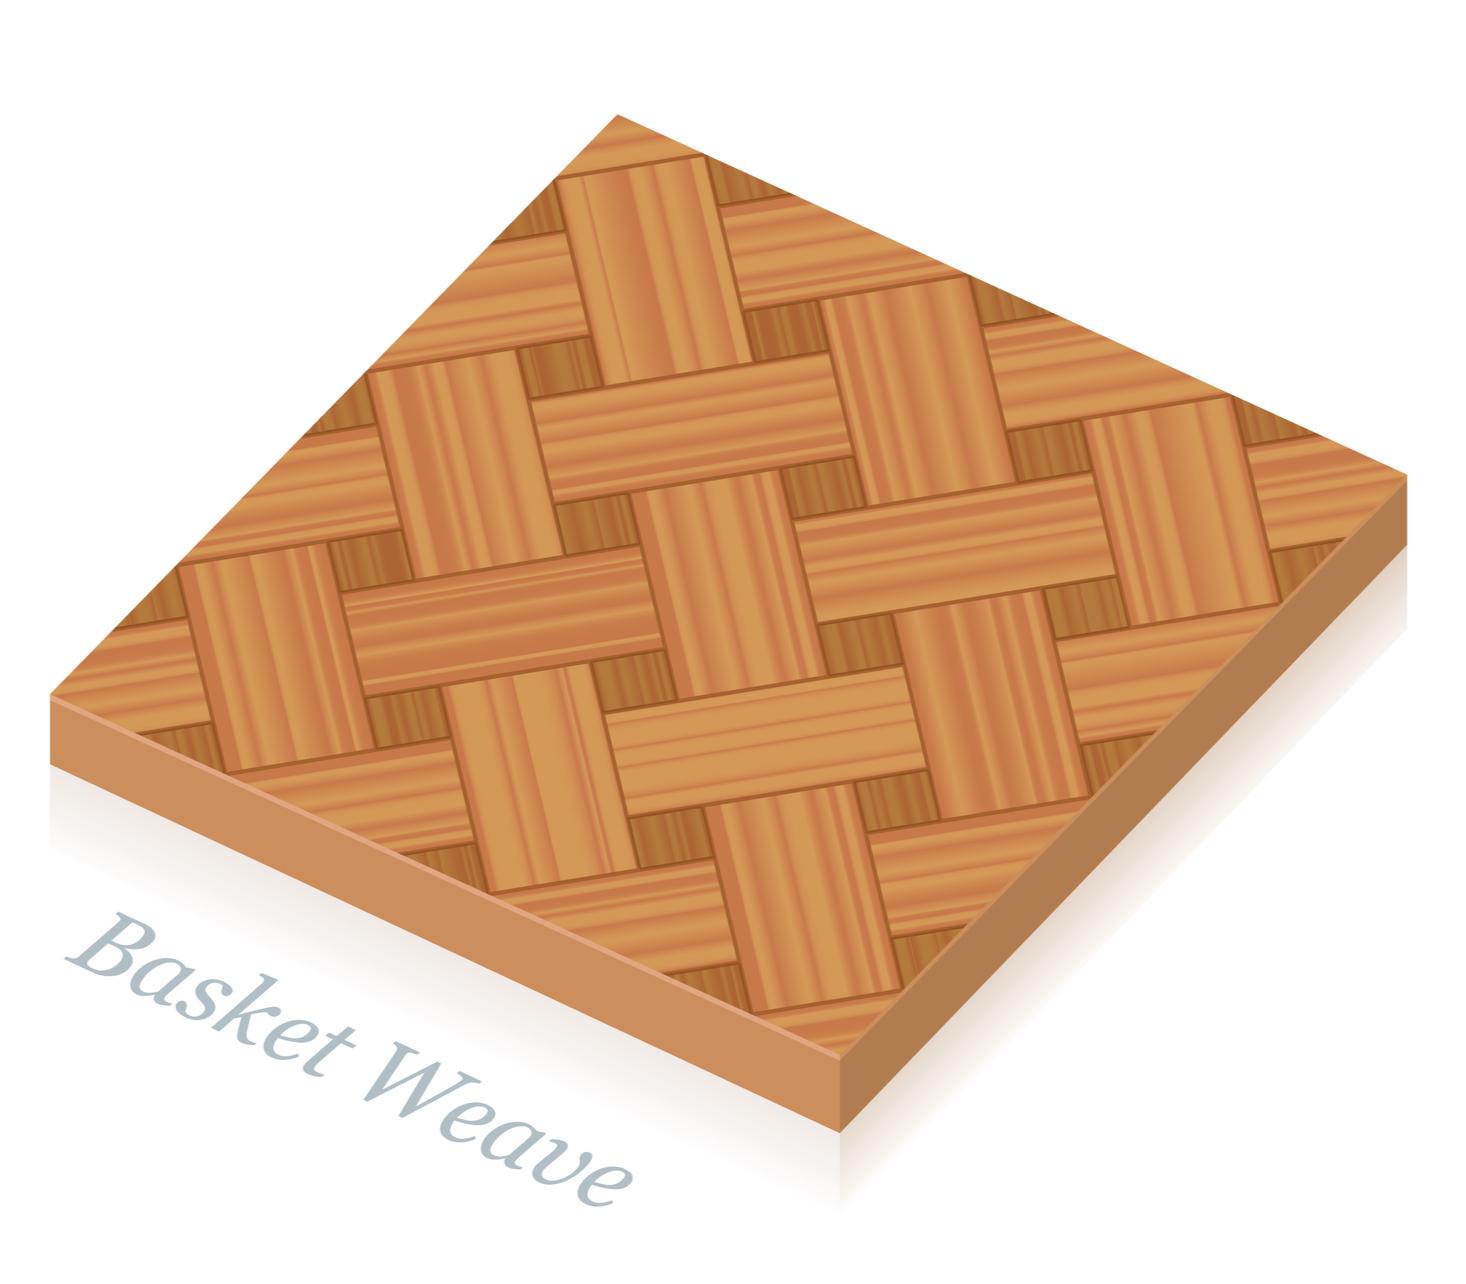 Basket Weave Parkettmuster